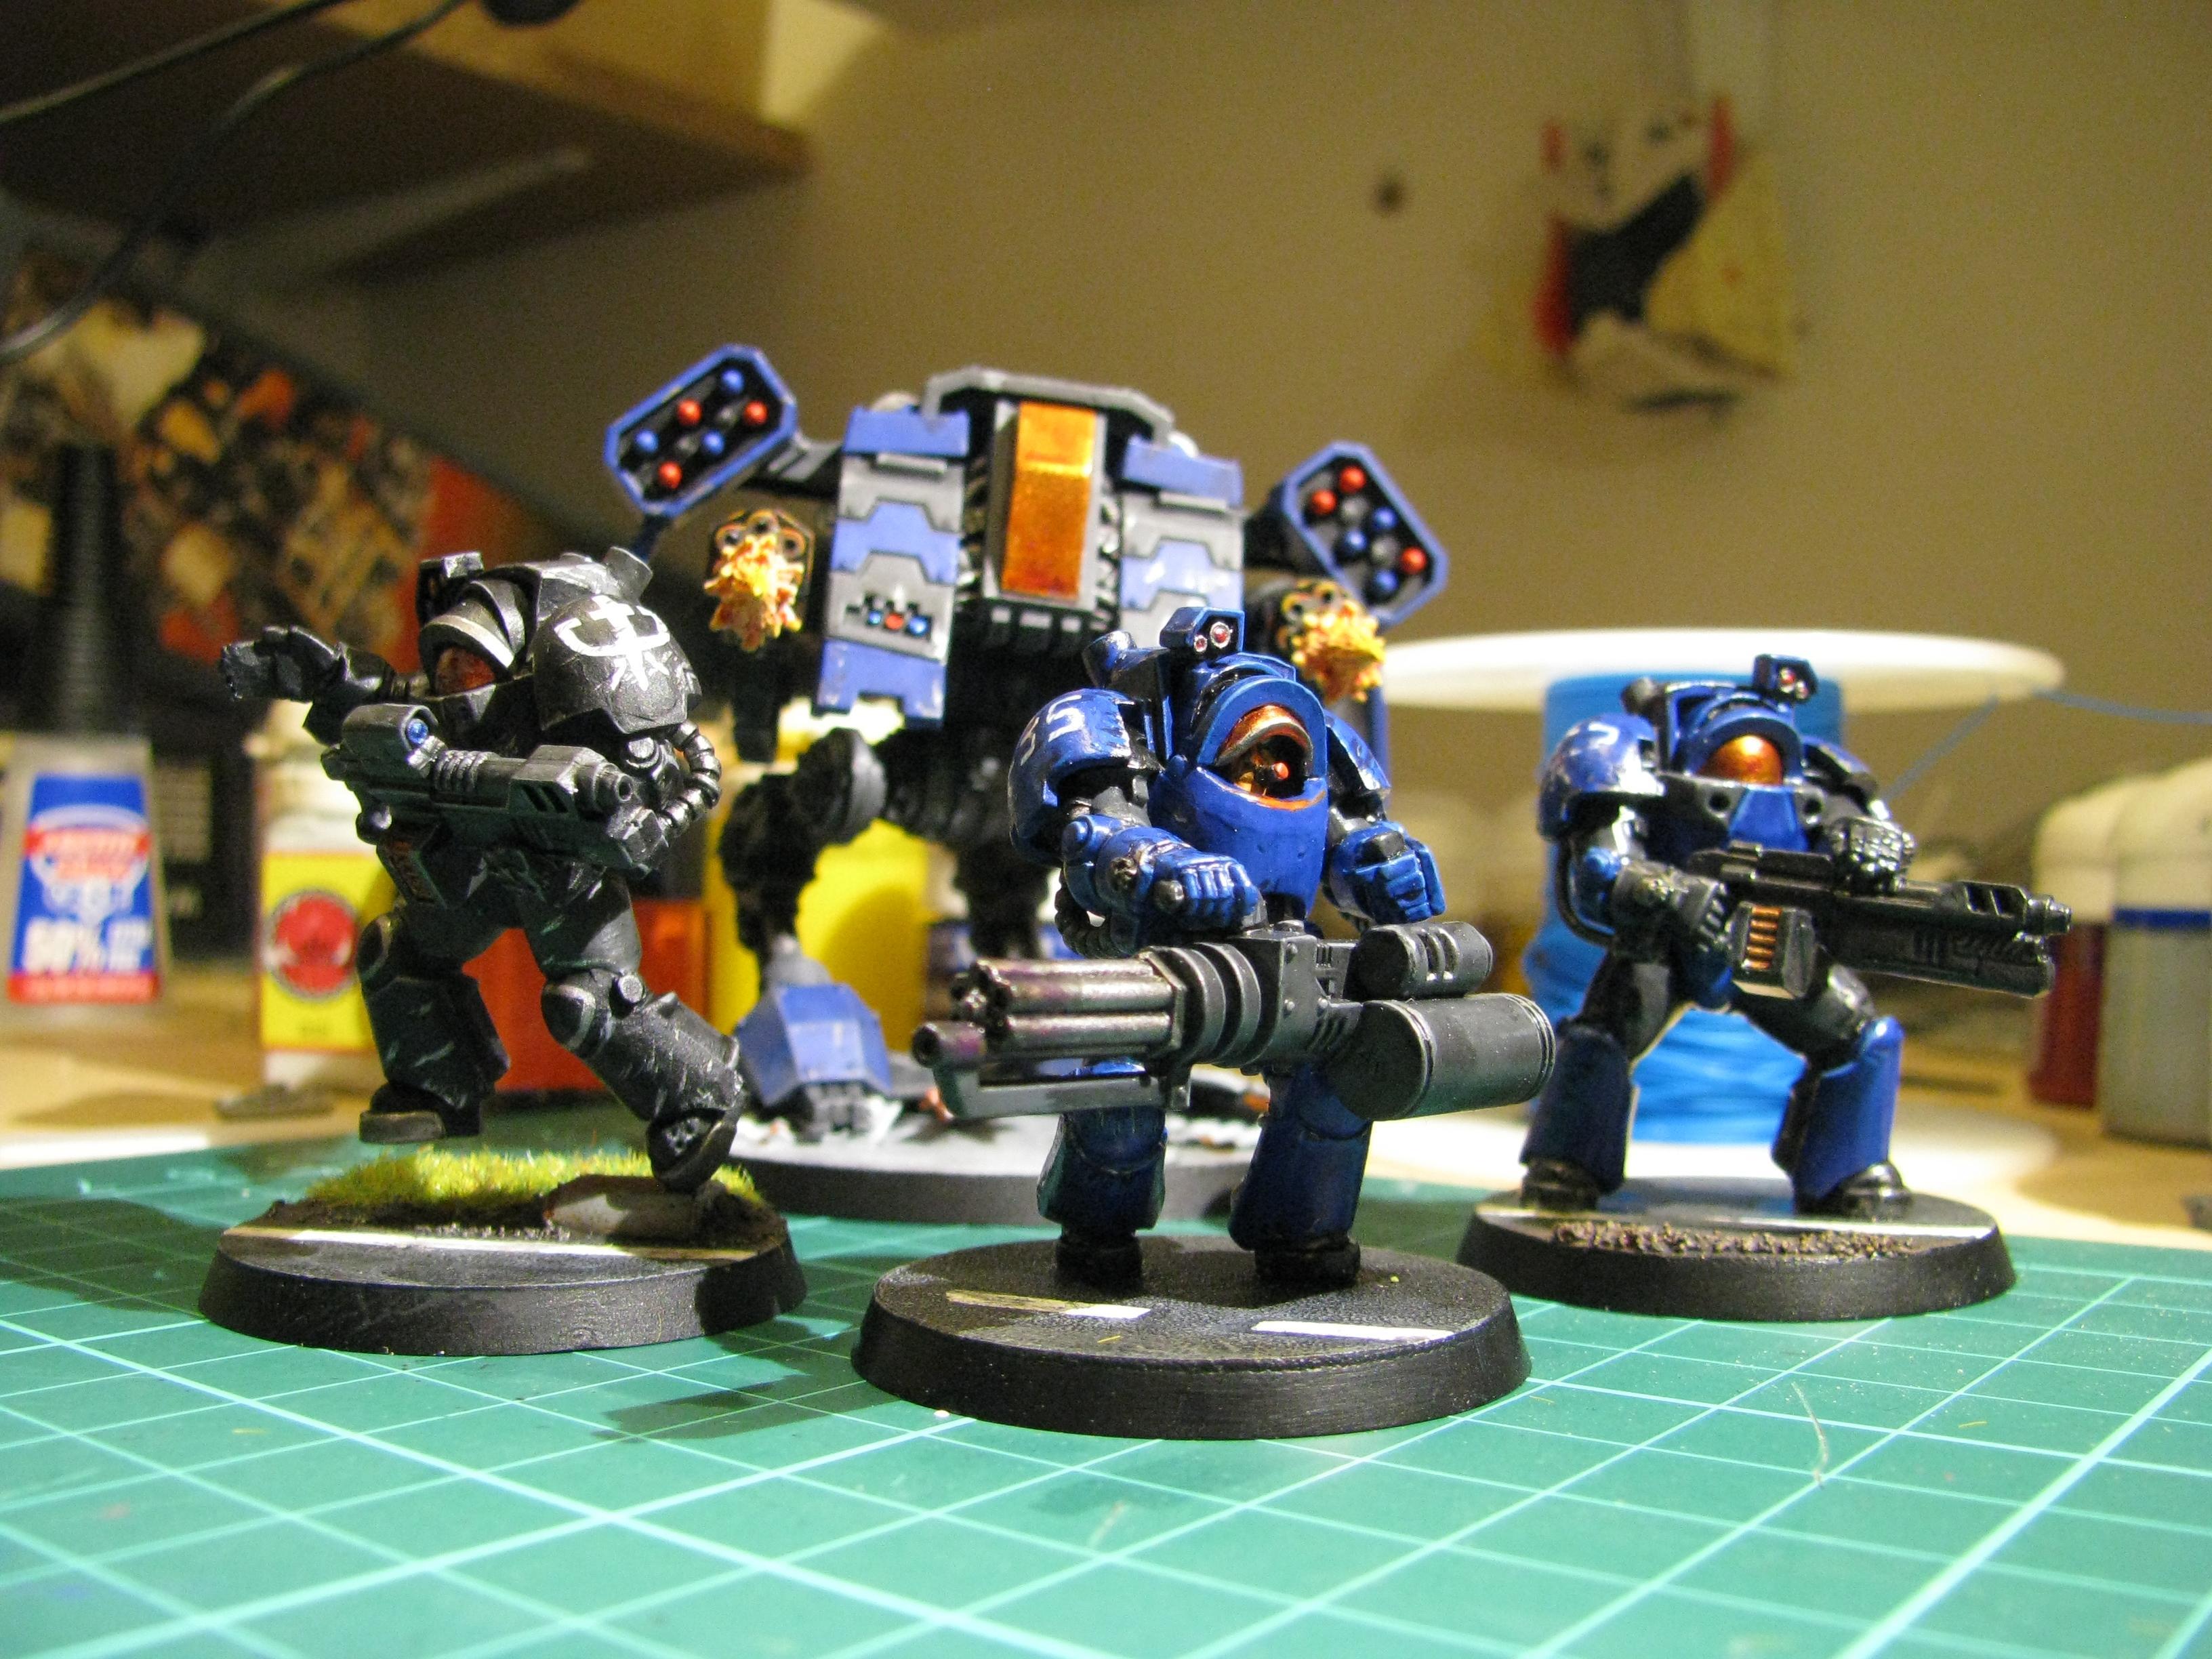 Belial, Deathwing, Jim Raynor, Sc2, Space Marines, Terran, Viking